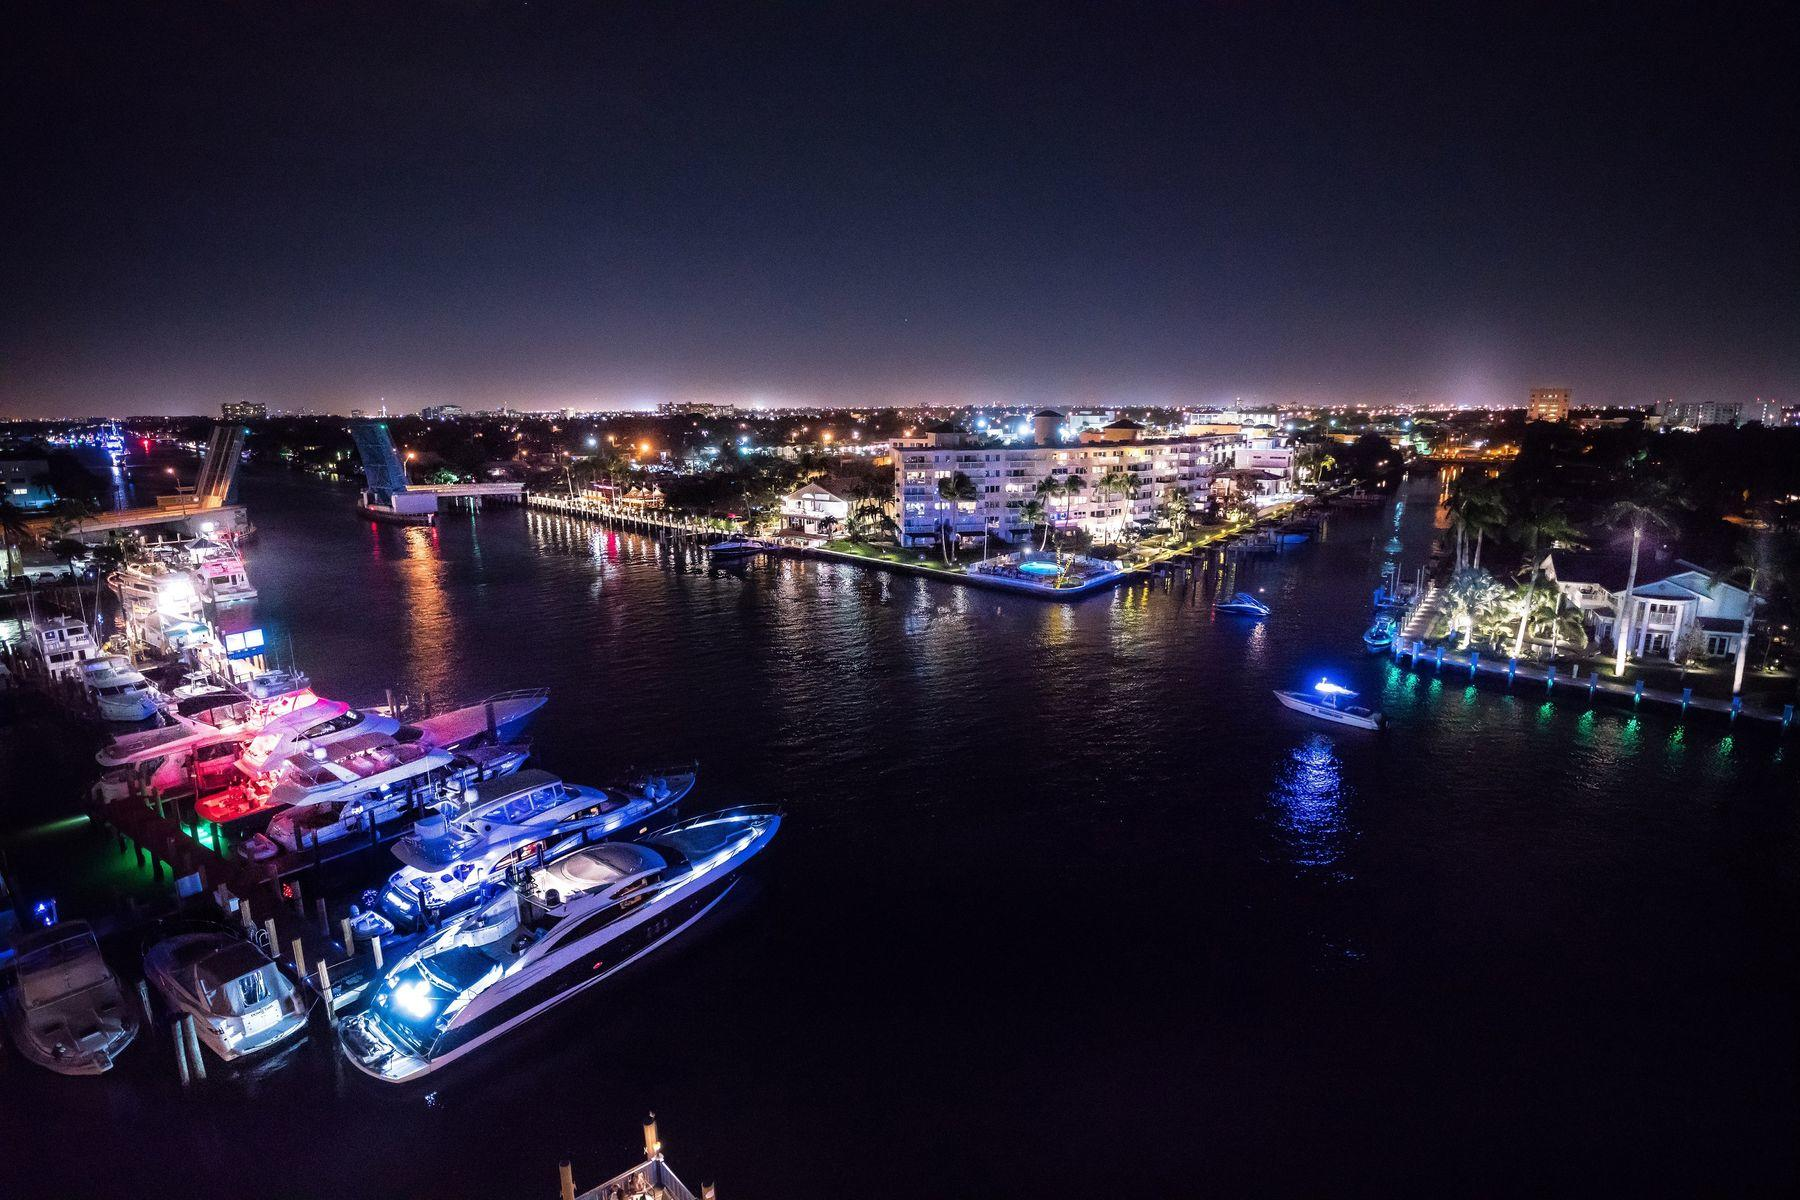 Sands Harbor - Instacoastal view - Night shot